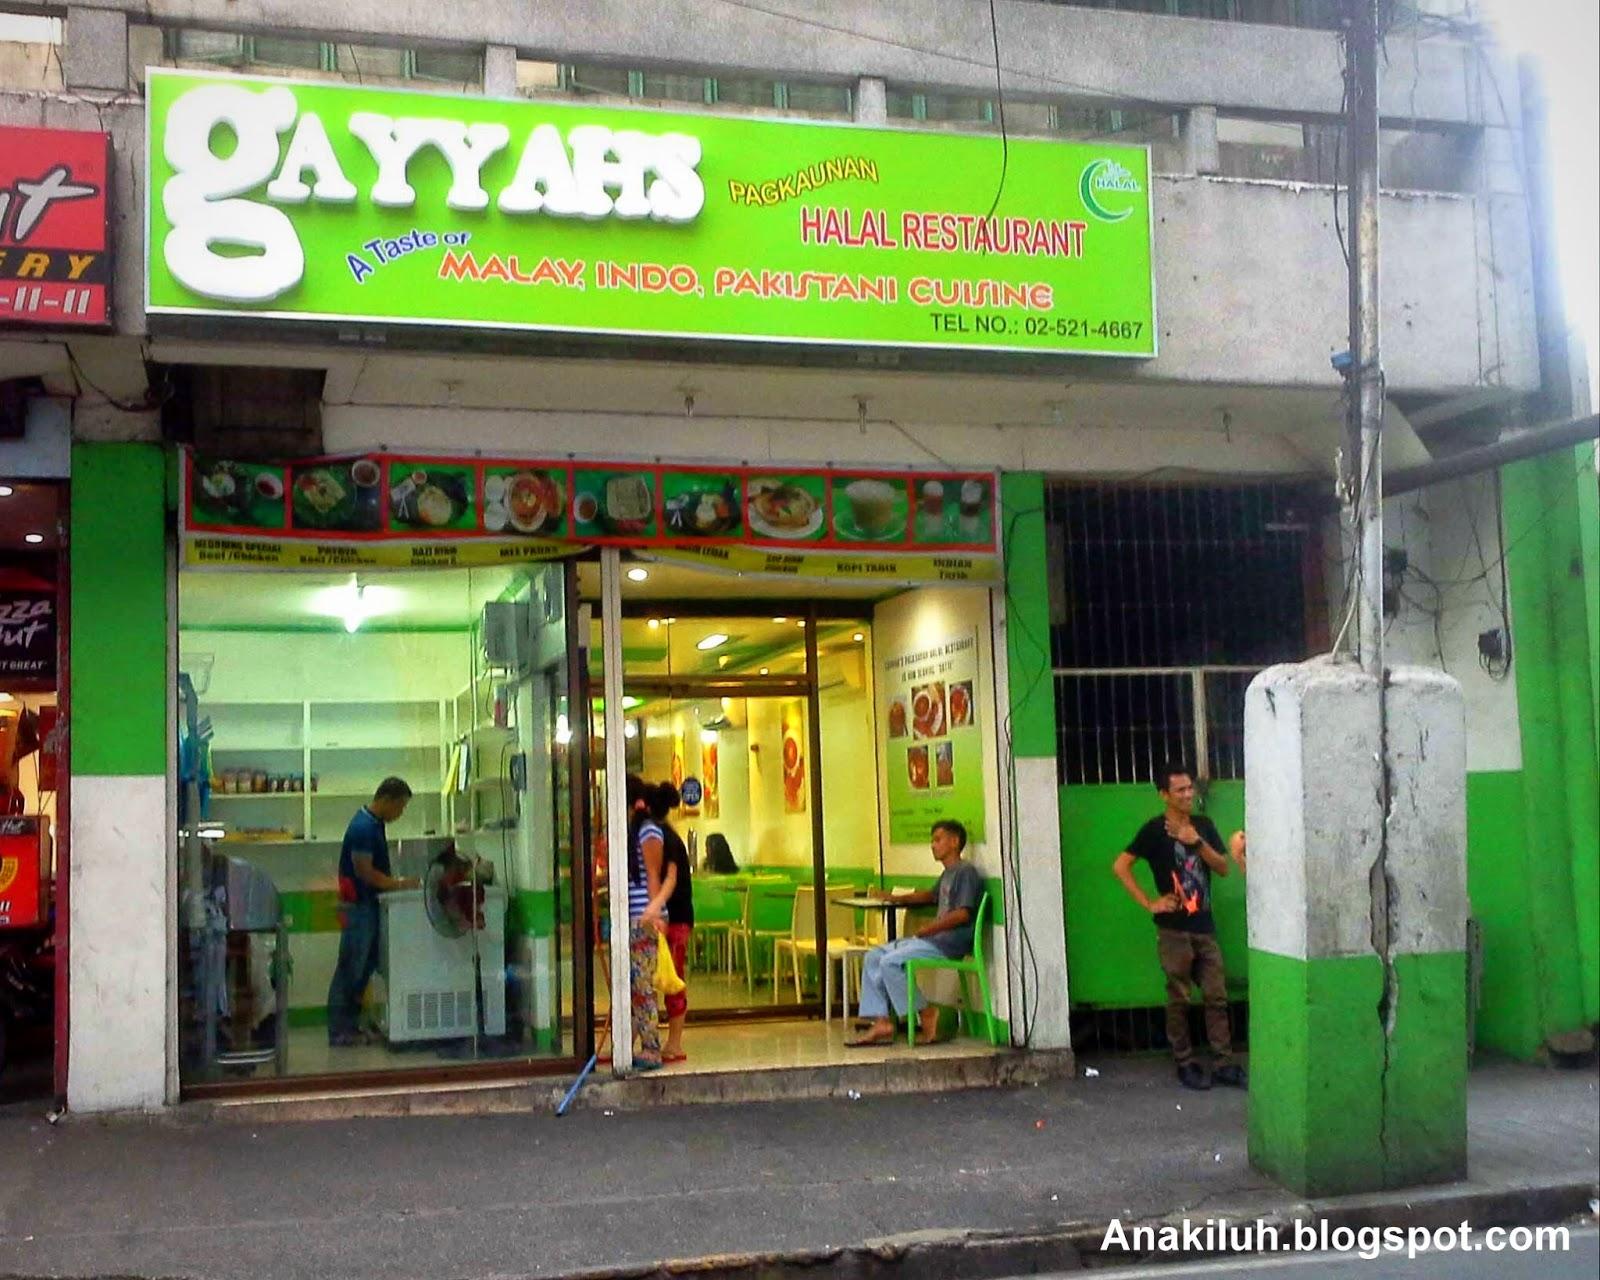 Halal Food cuisine Malaysian